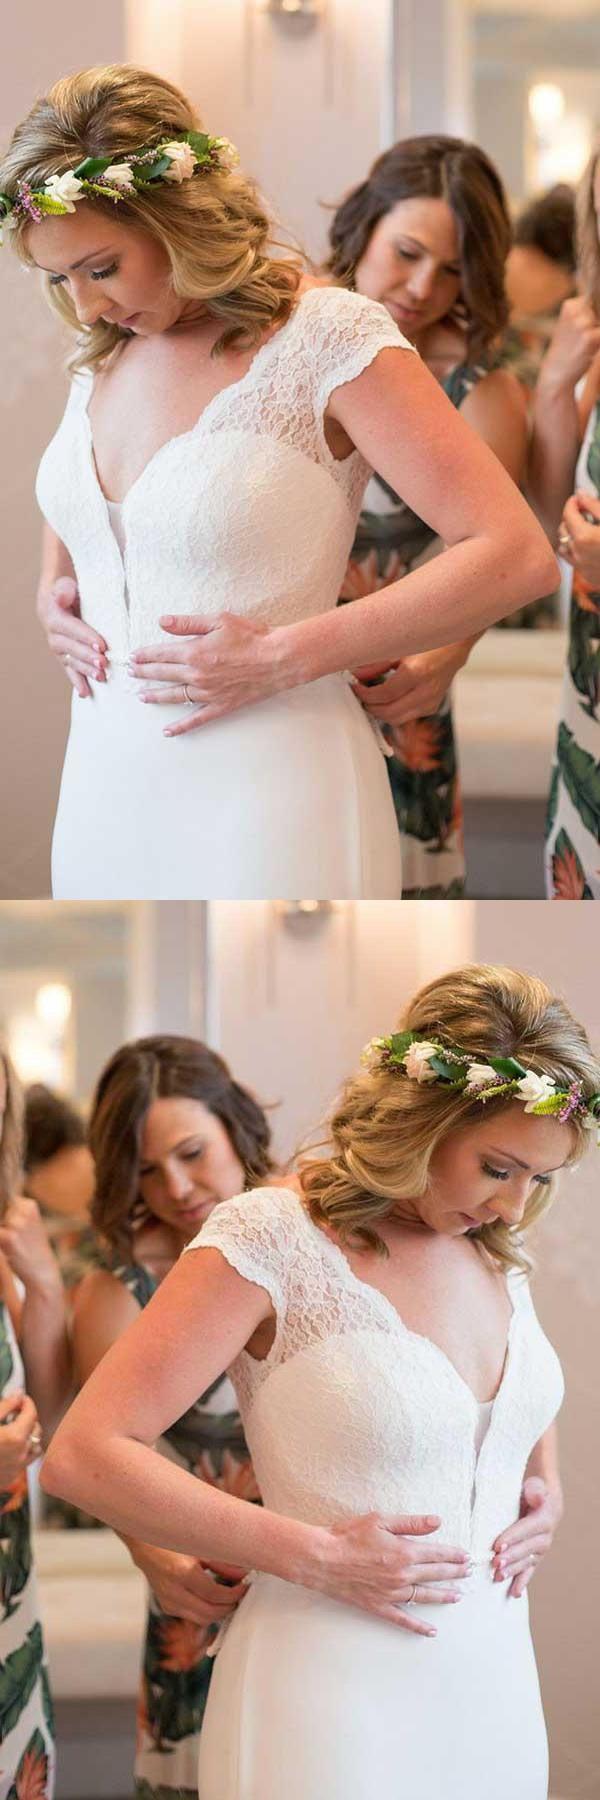 Customized Colorful Wedding Dress Lace, Mermaid Wedding Dress, V Neck Wedding Dress